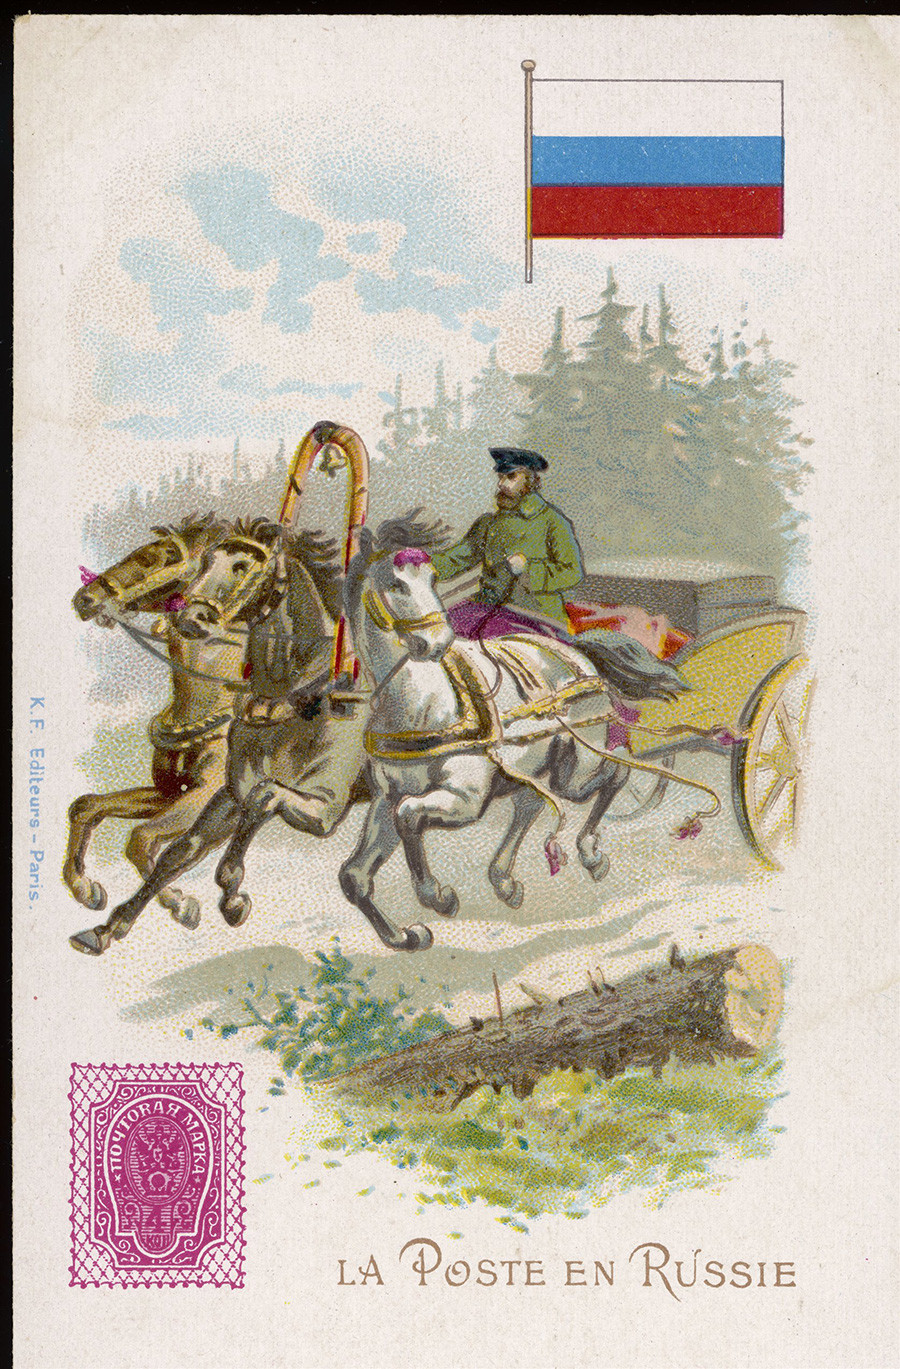 Illustration du début du XXe siècle